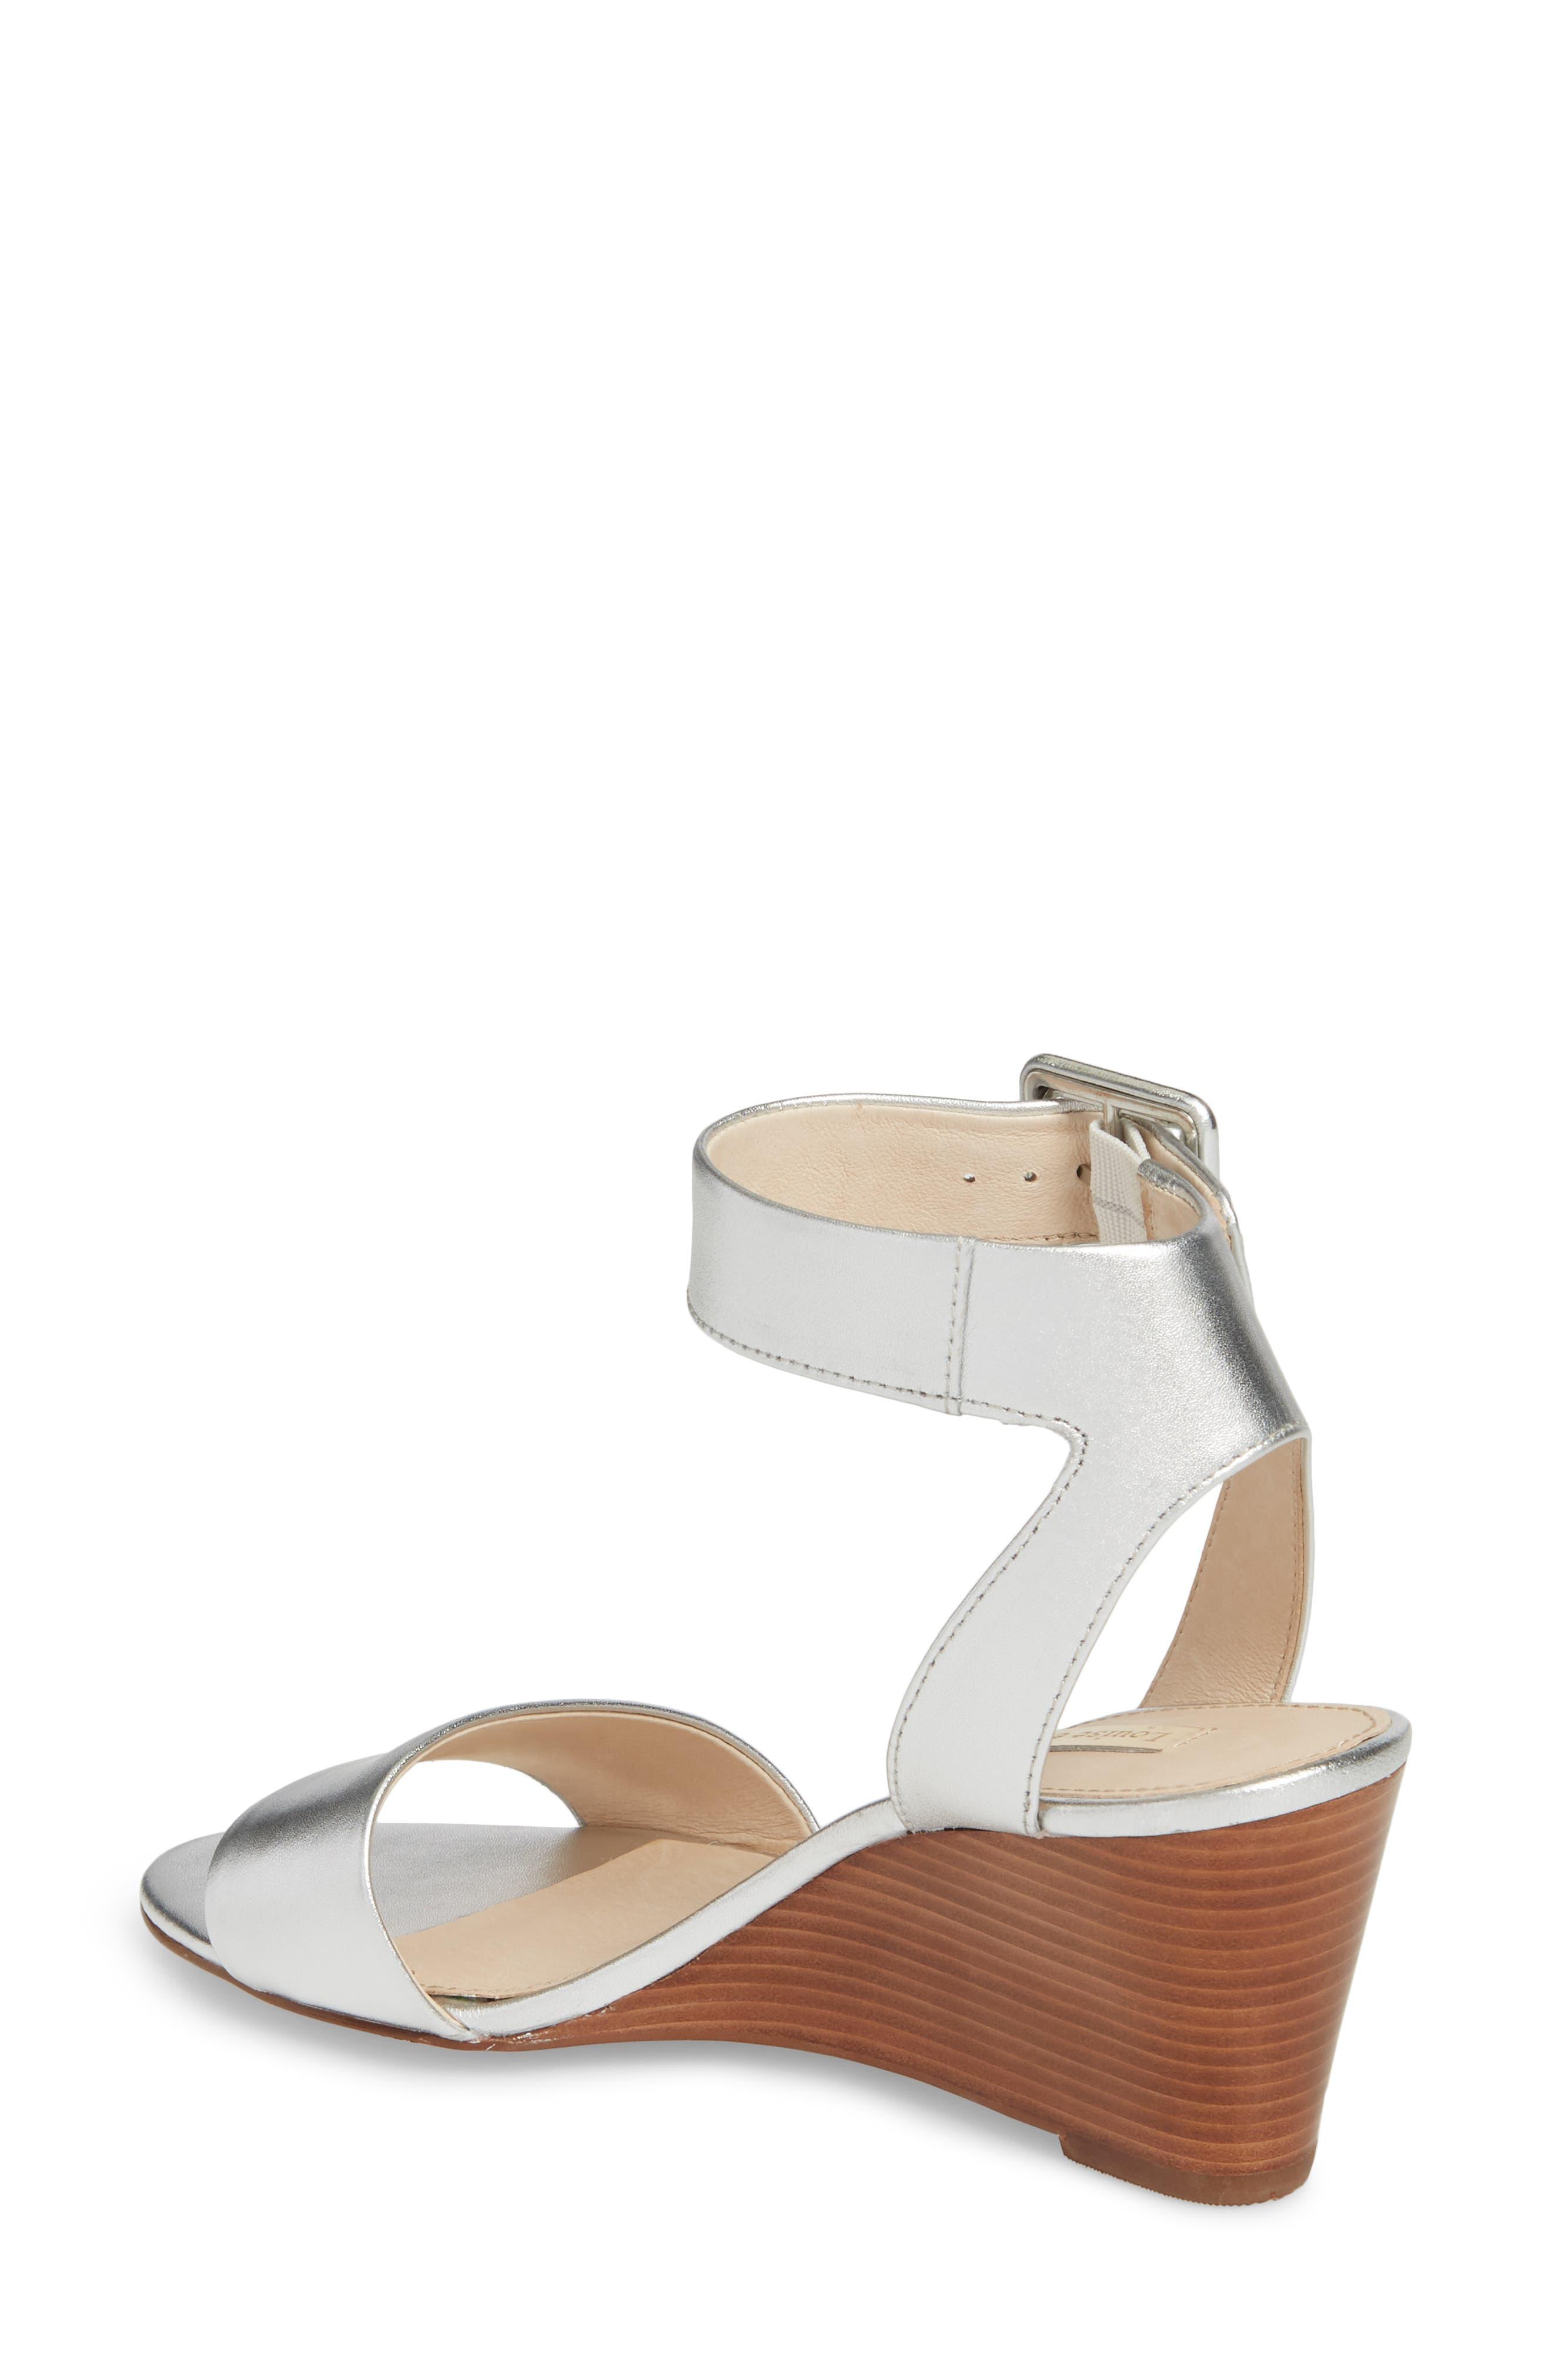 Punya Wedge Sandal,                             Alternate thumbnail 2, color,                             Metallic Silver Leather